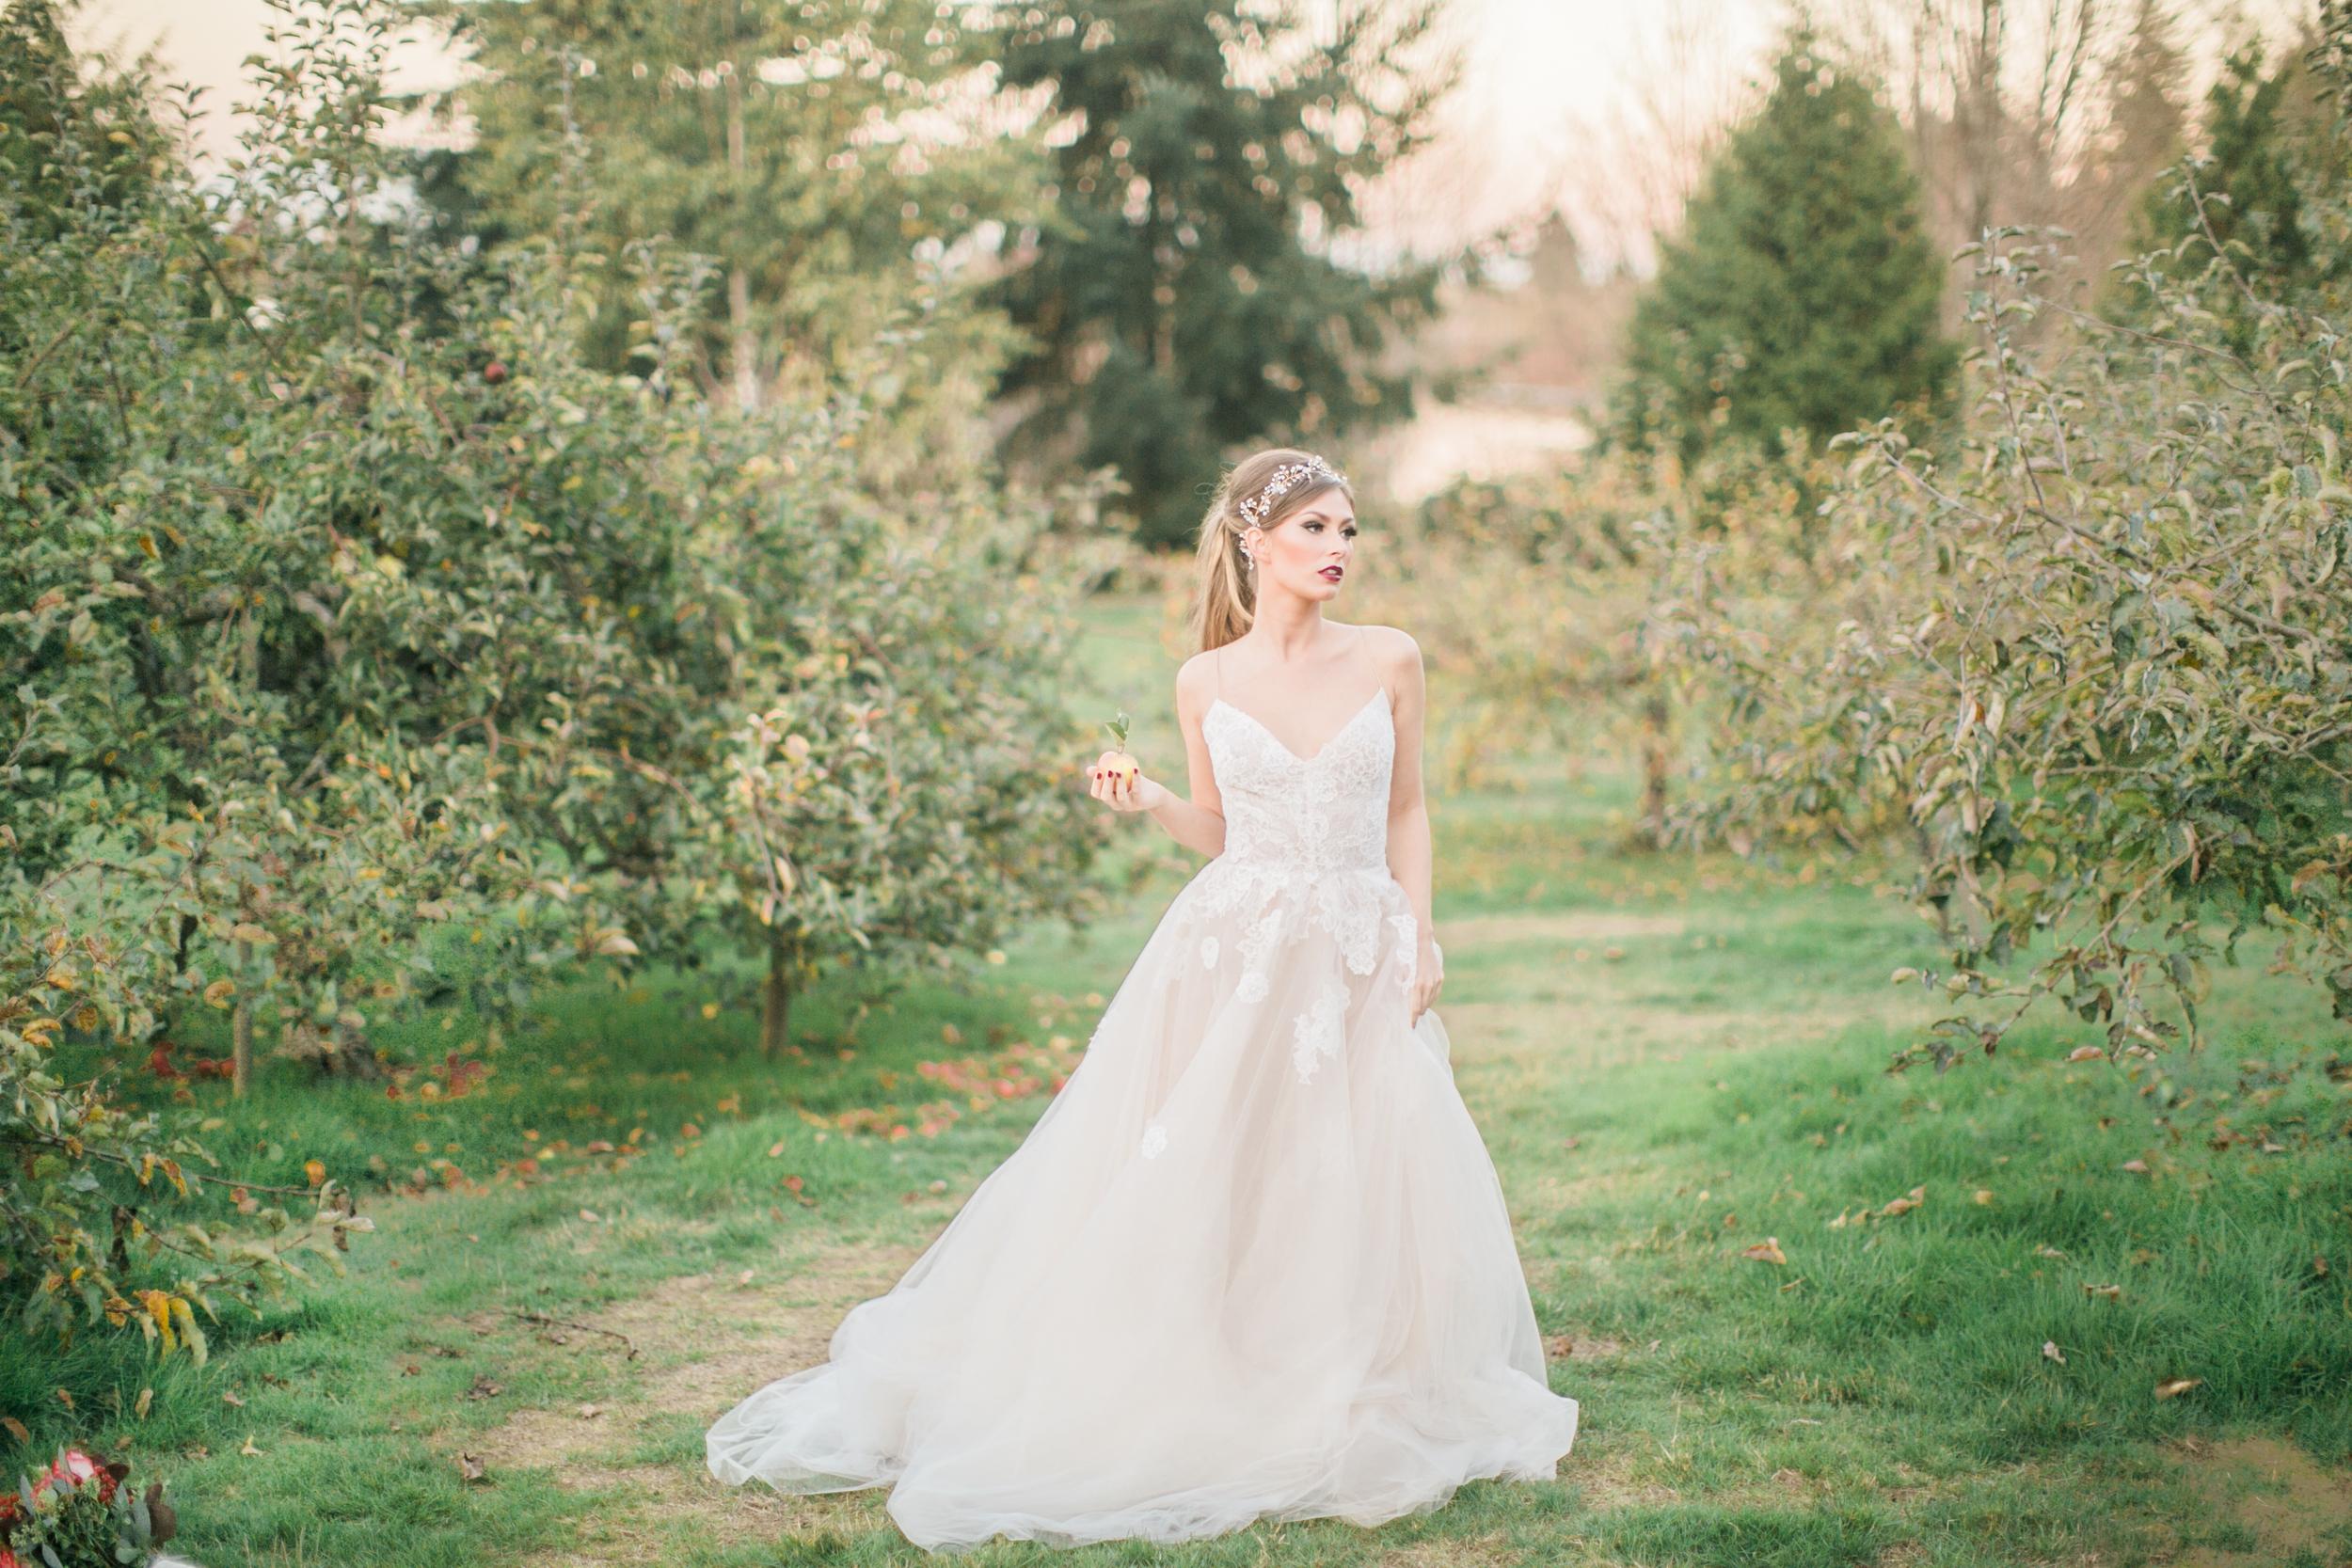 Snow White Inspiration Shoot | Disney Wedding | Simply Sweet Photography by Nomo Akisawa | Joy Wed blog